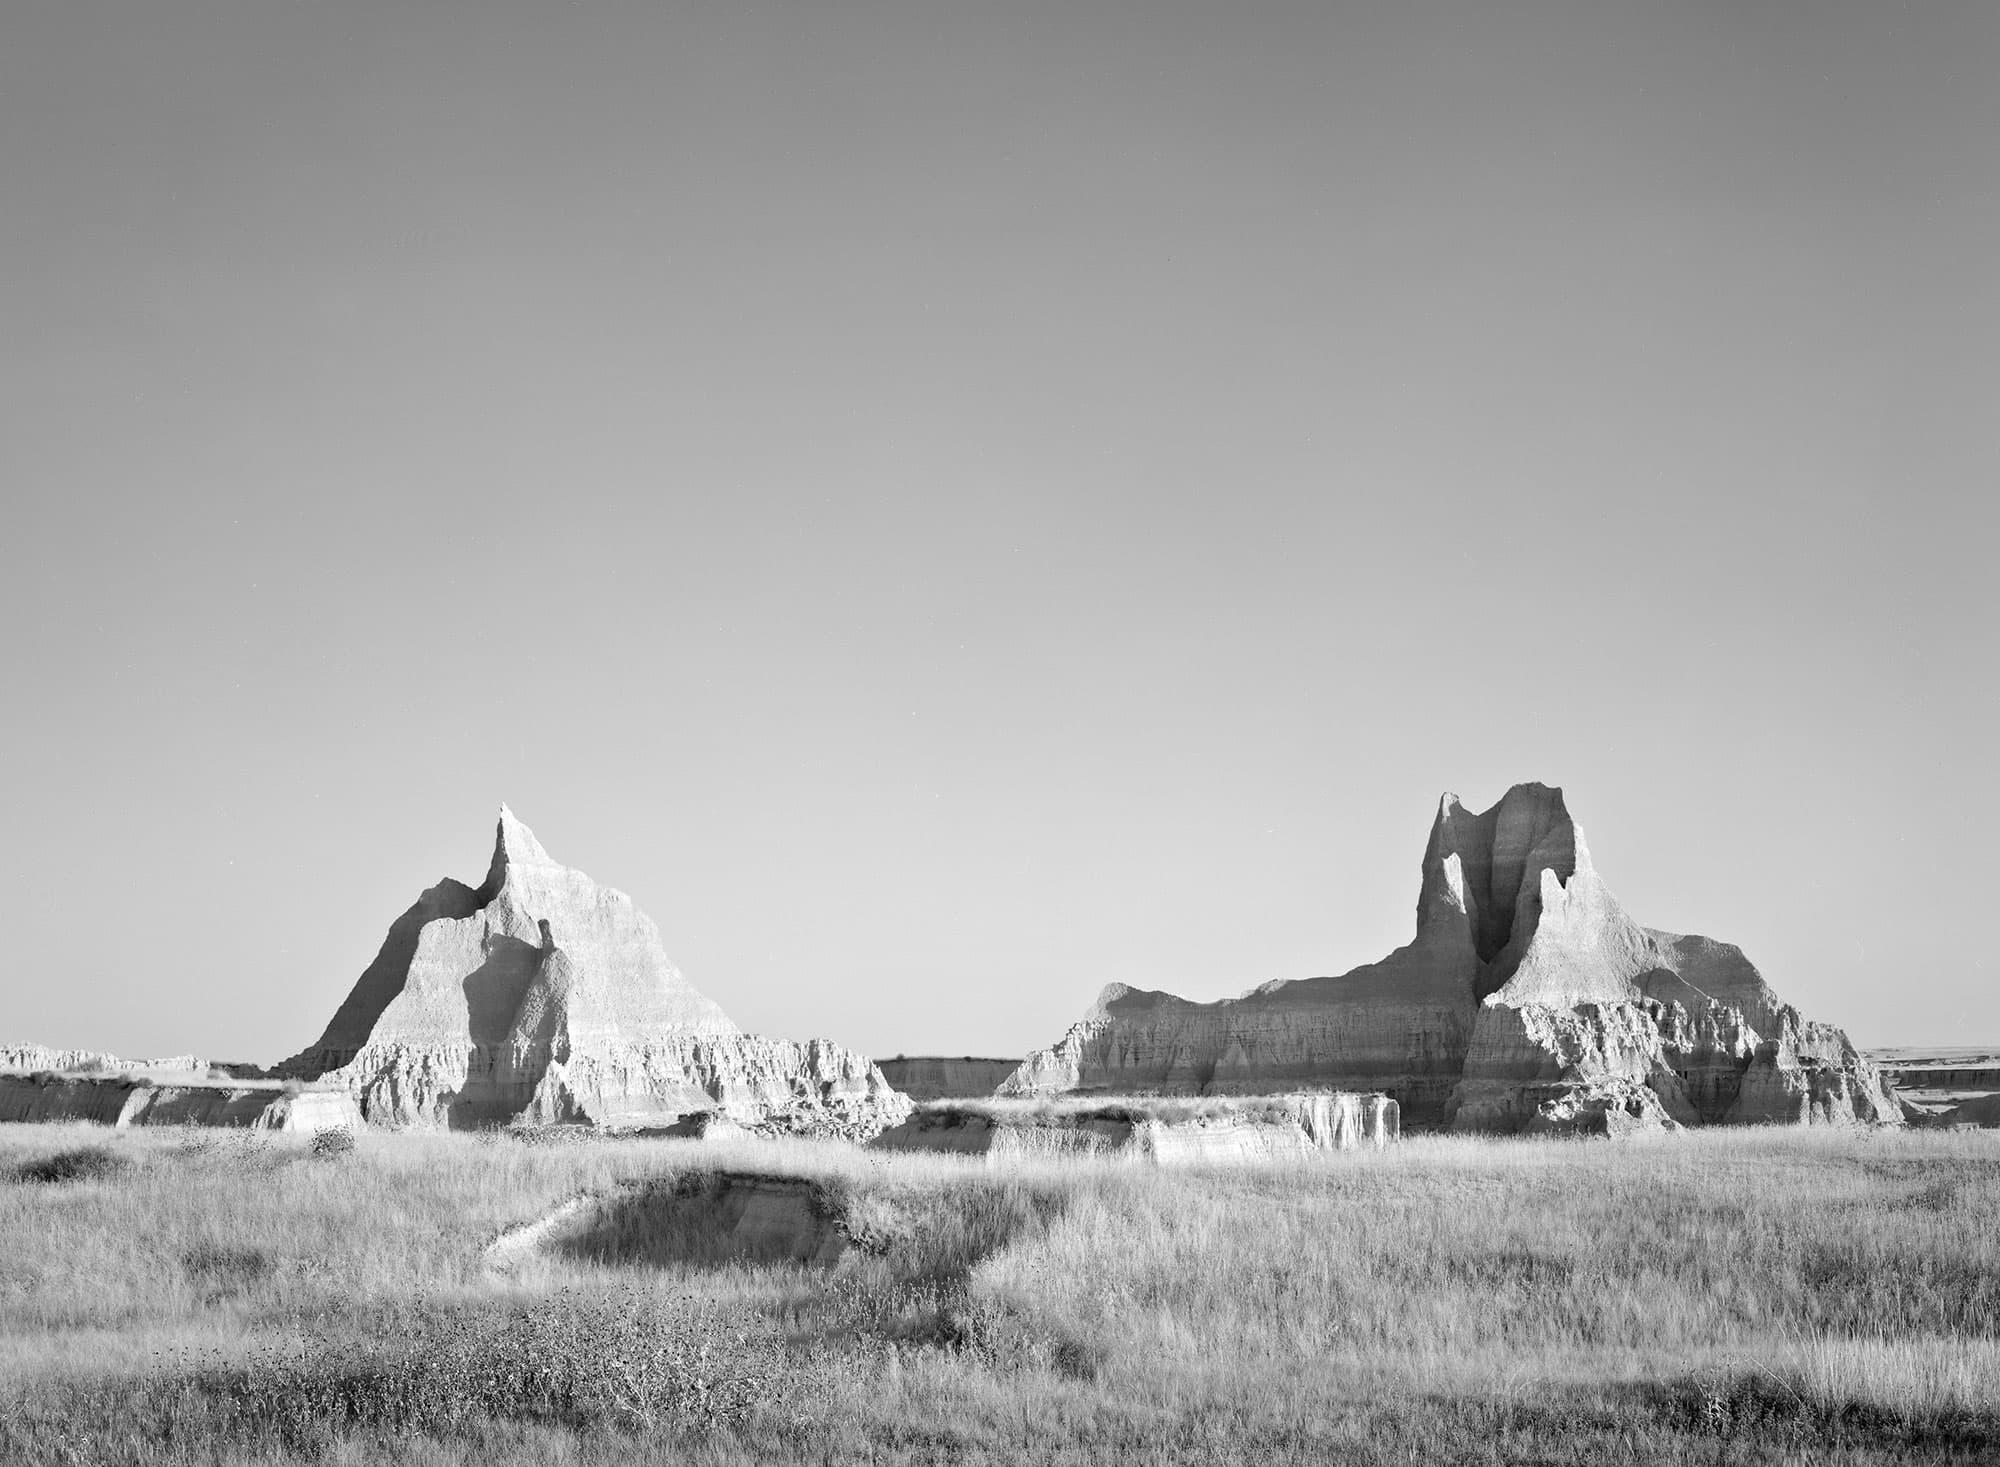 arthur-lazar-Badlands-South-Dakota-1991